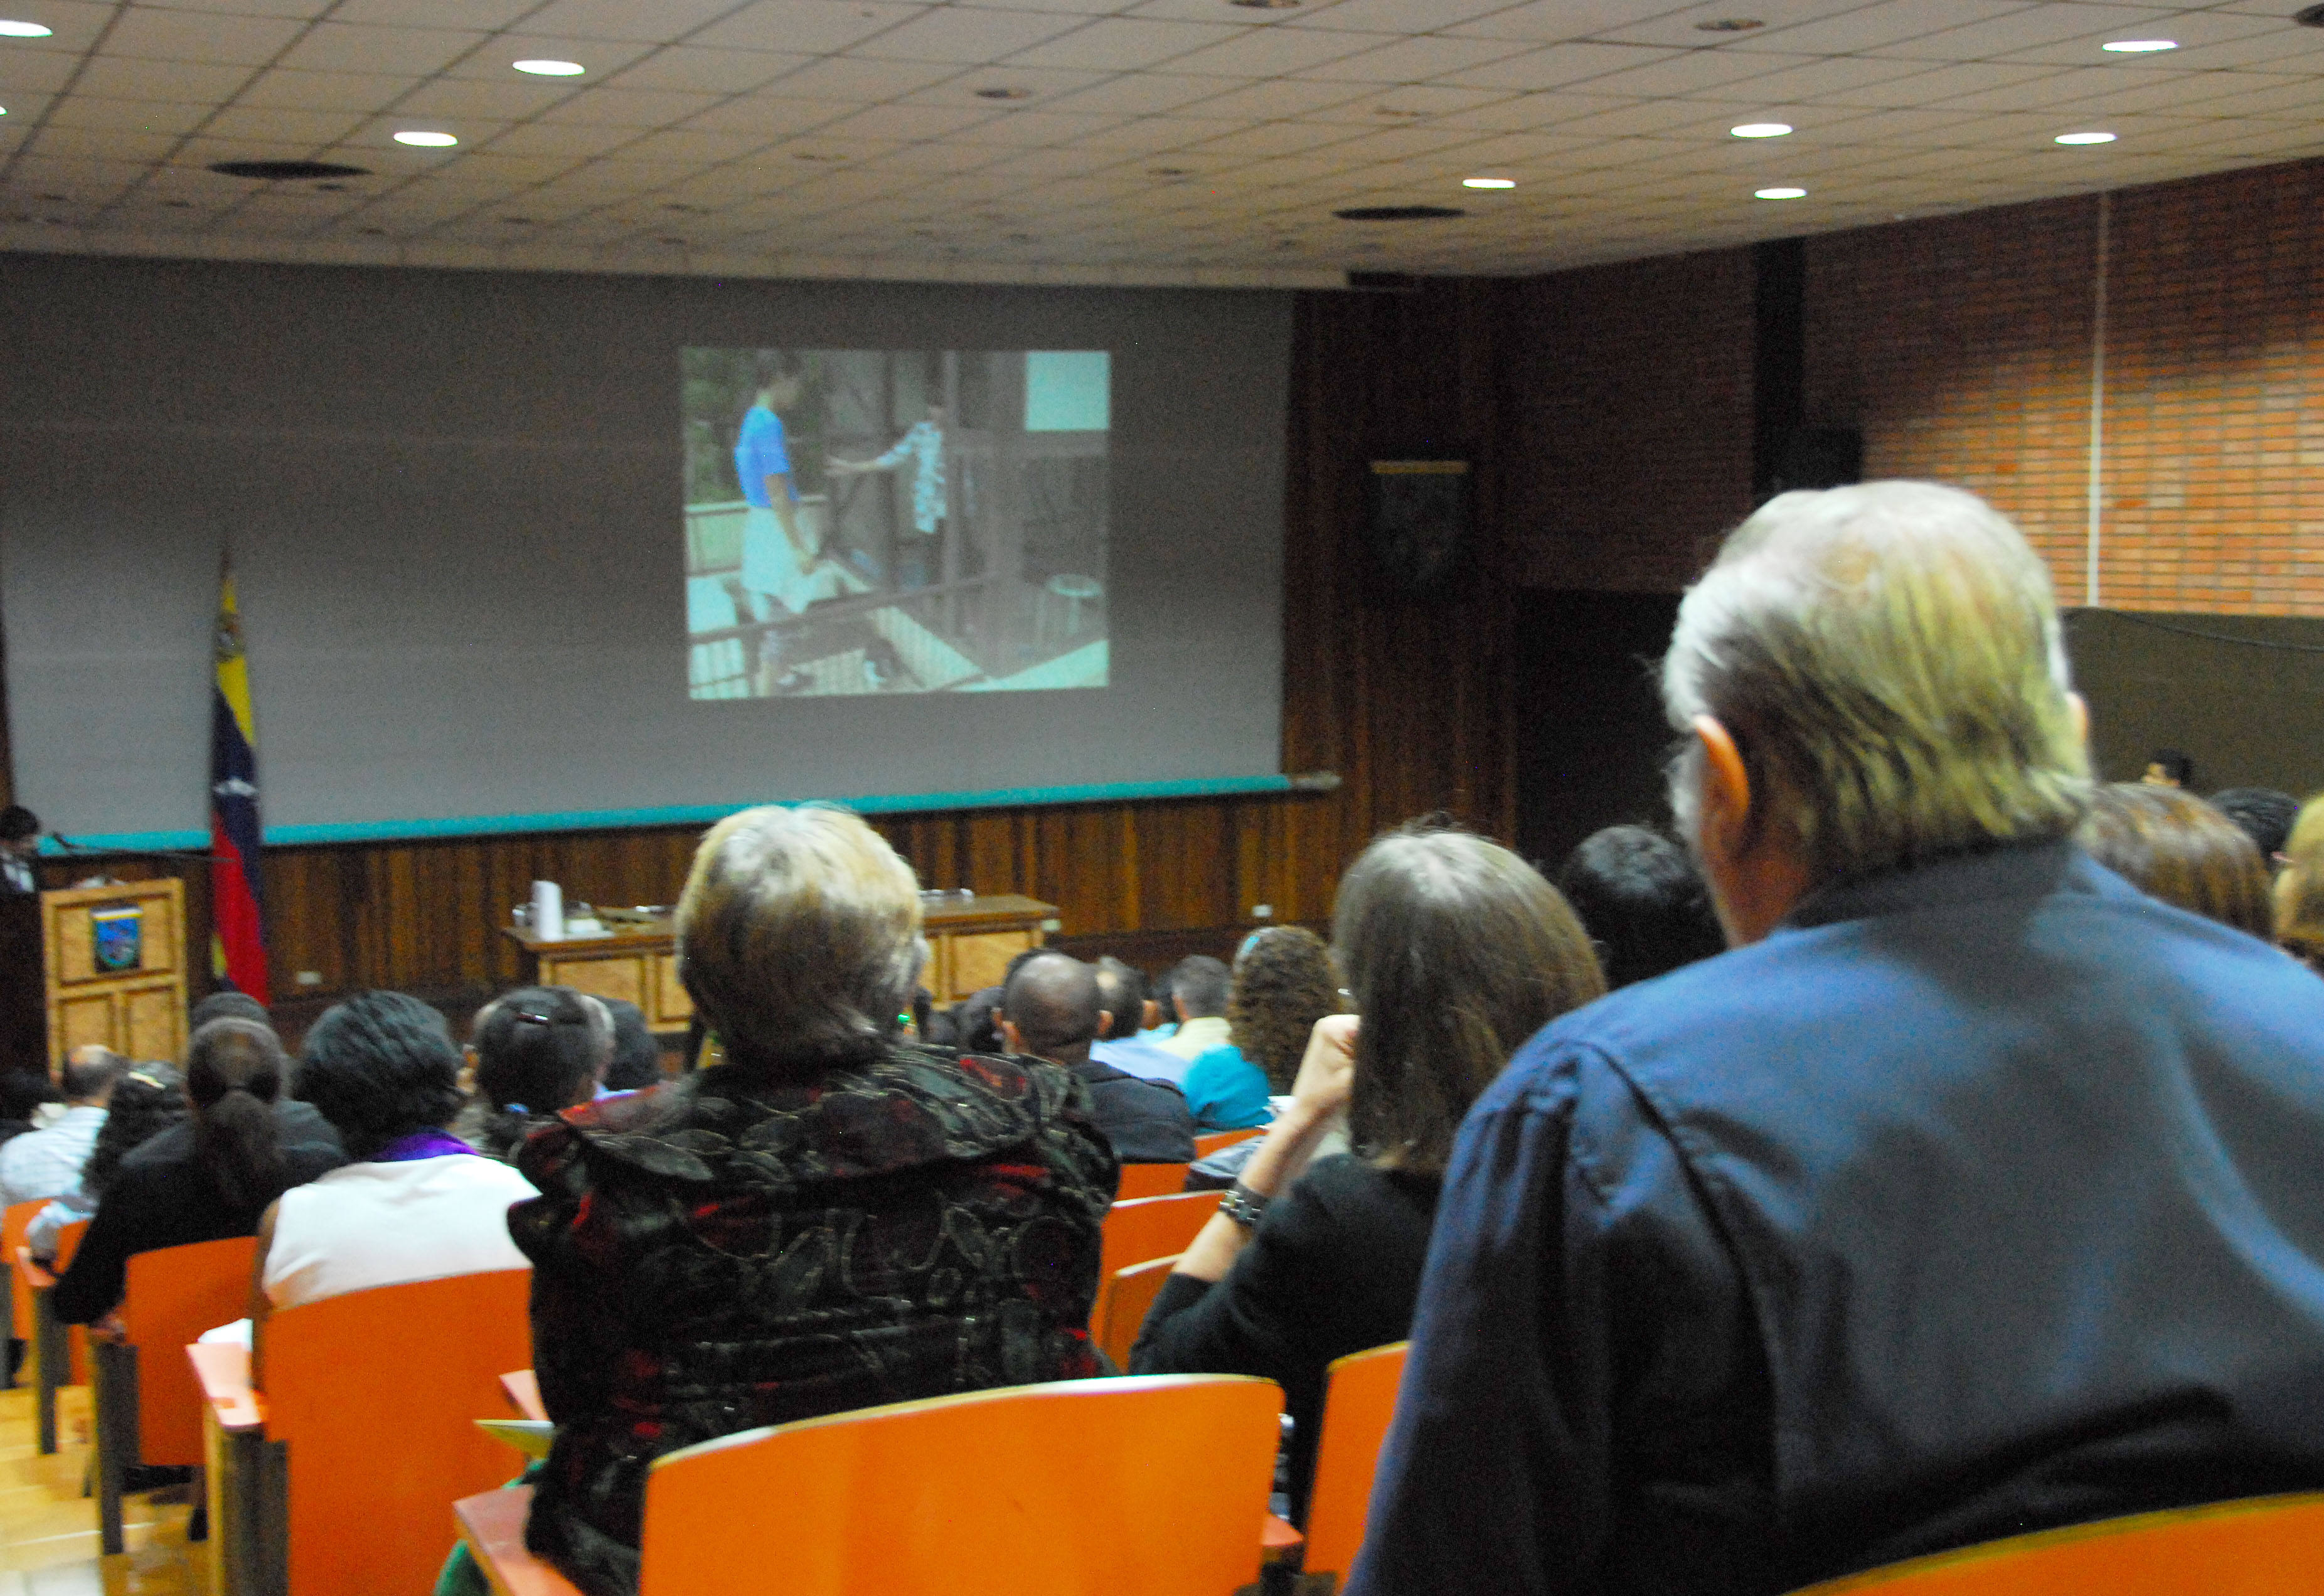 Congreso de Innovación Educativa llamó a actualizar métodos de enseñanza